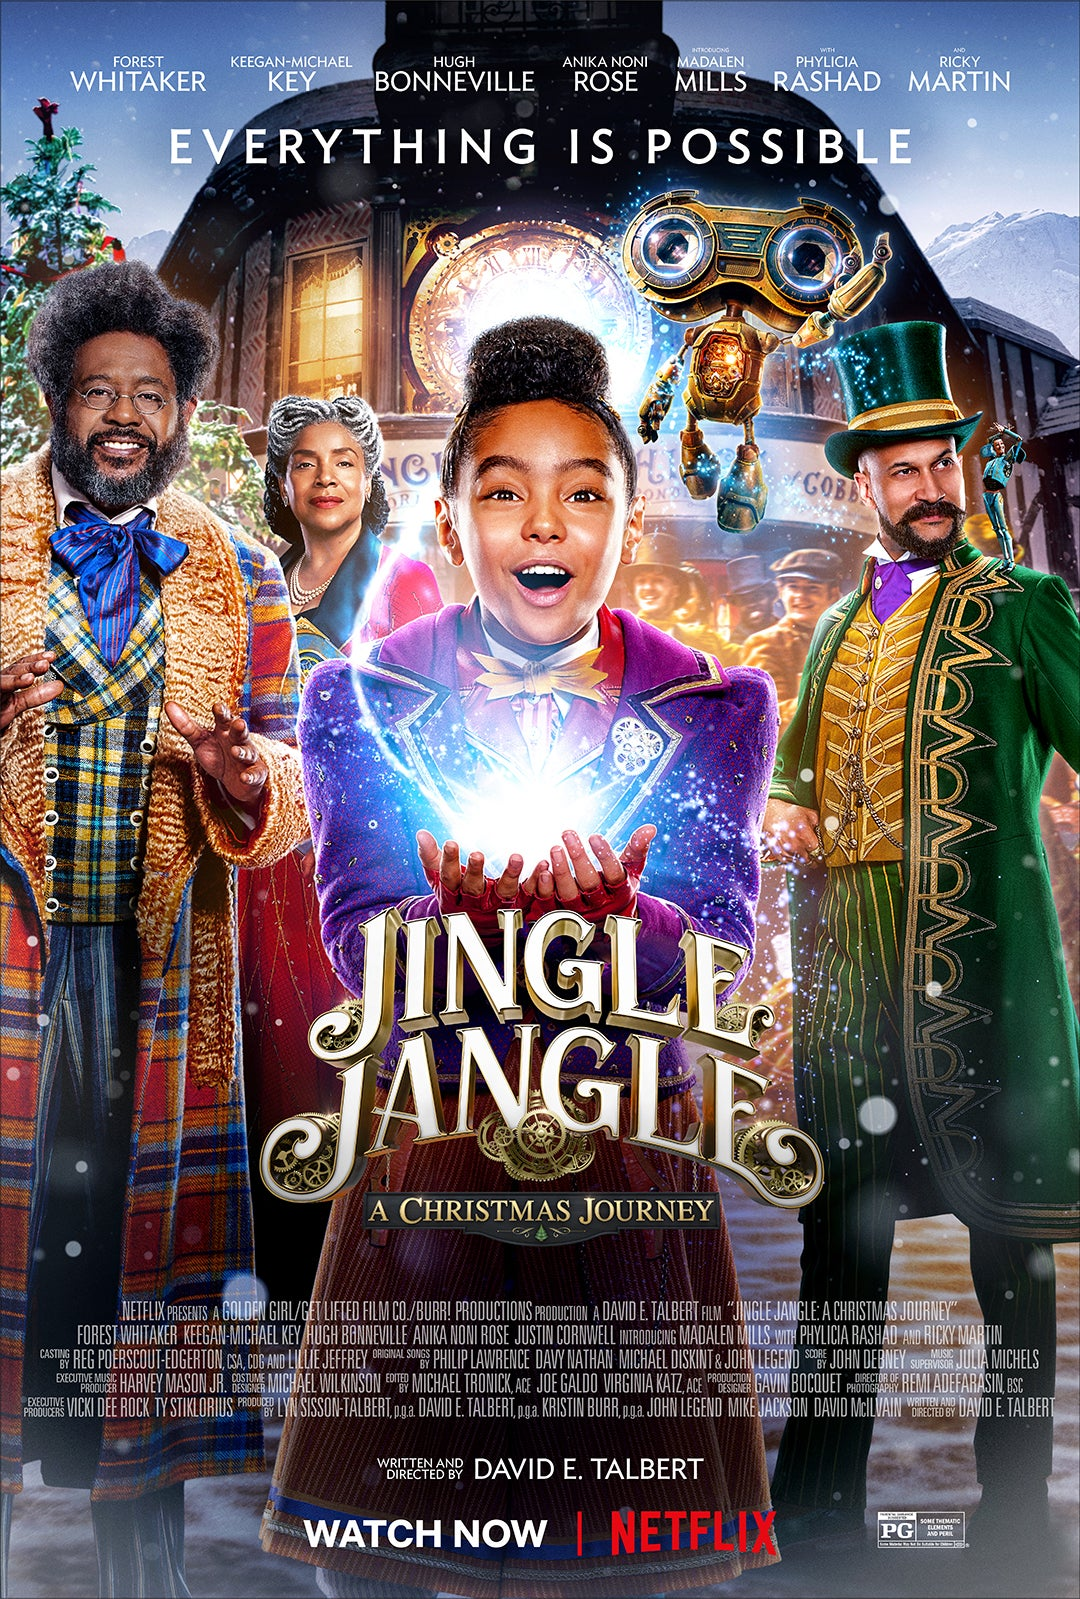 Jingle Jangle: A Christmas Journey. Click to WATCH NOW.